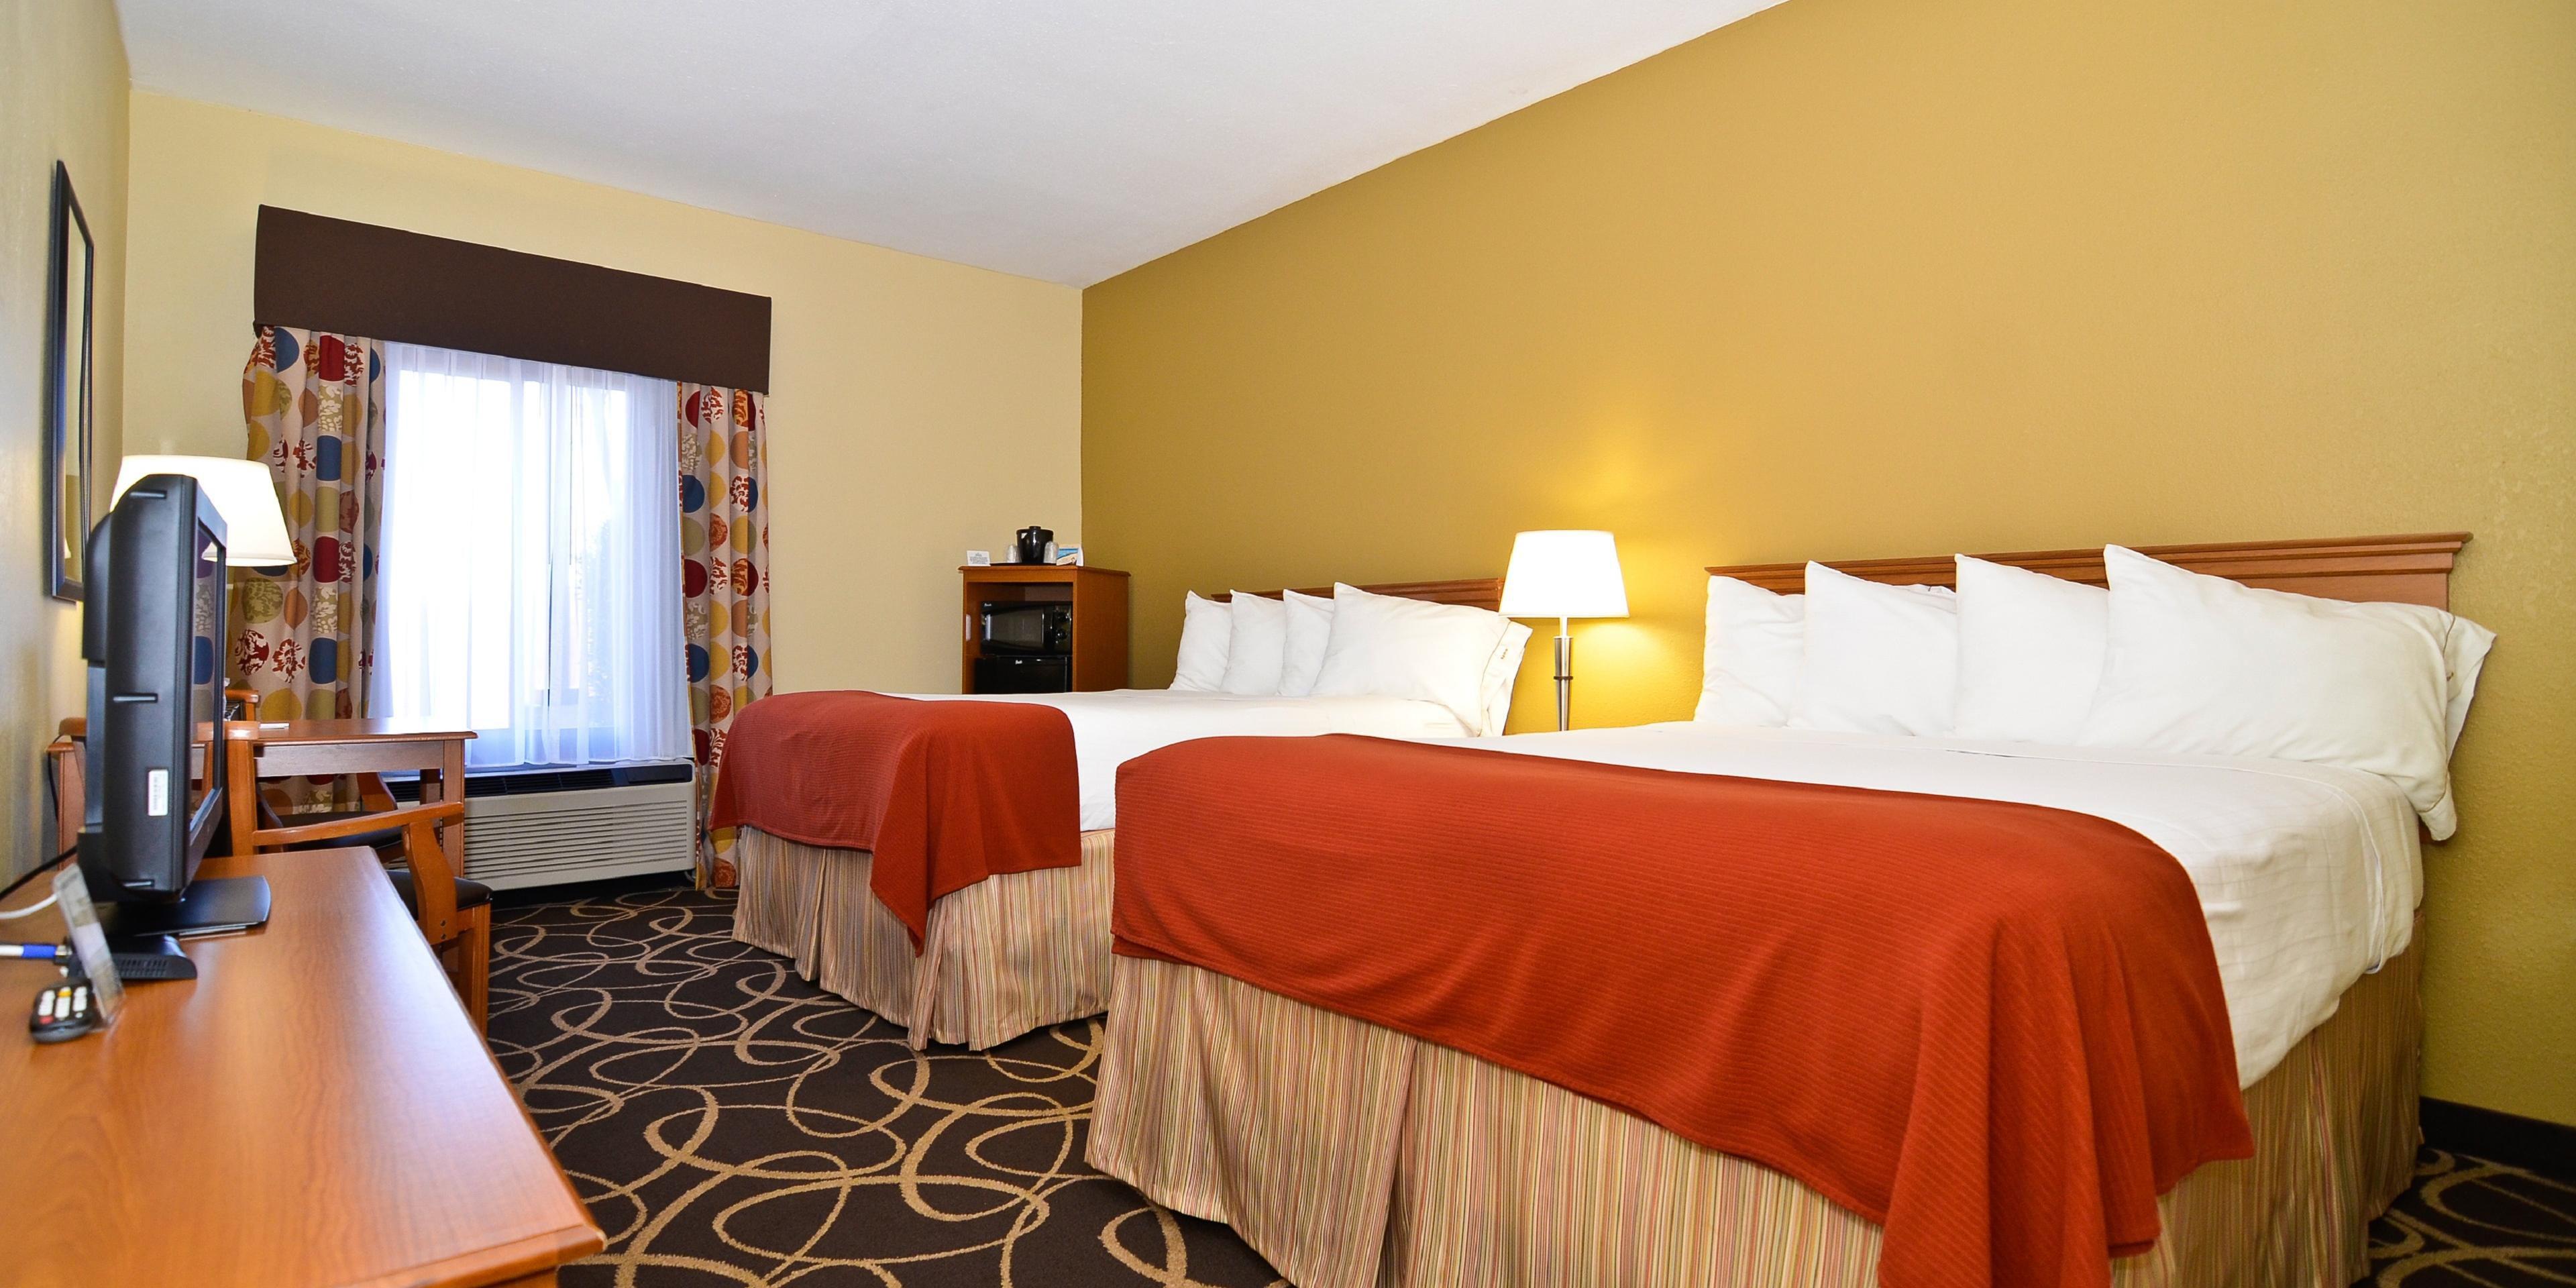 holiday inn express stone mountain 3712895002 2x1 Stone Mountain Hotel Holiday Inn